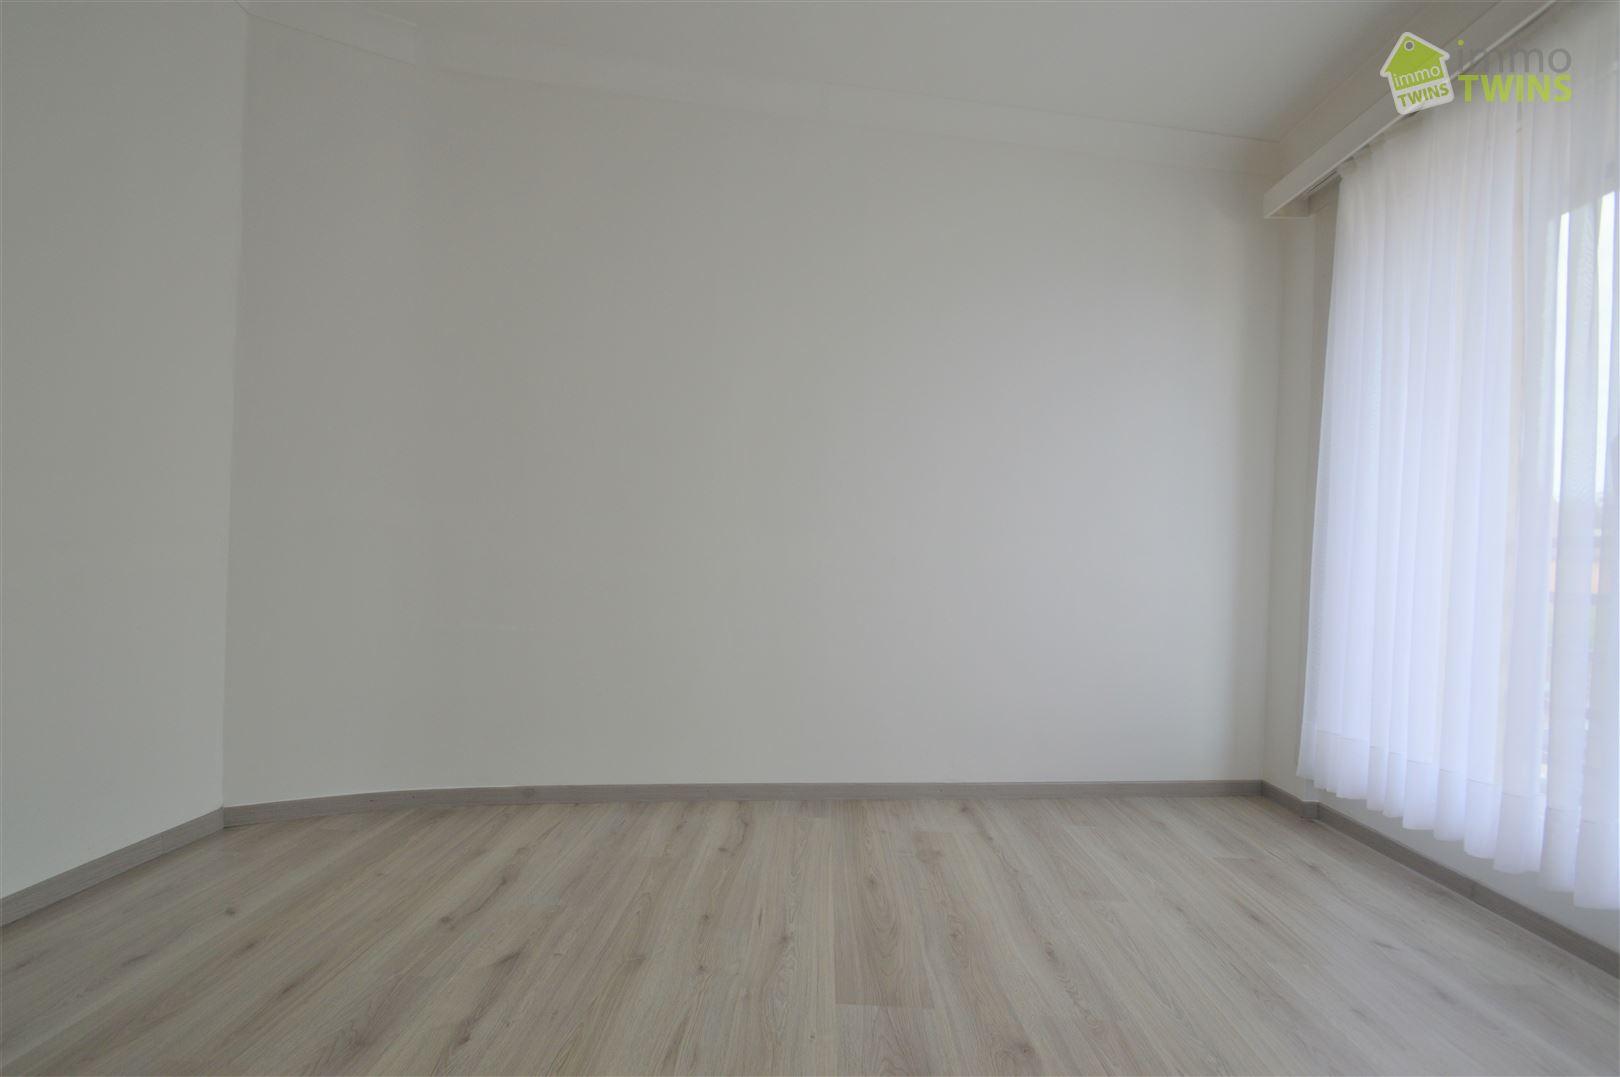 Foto 11 : Appartement te 9280 LEBBEKE (België) - Prijs € 650